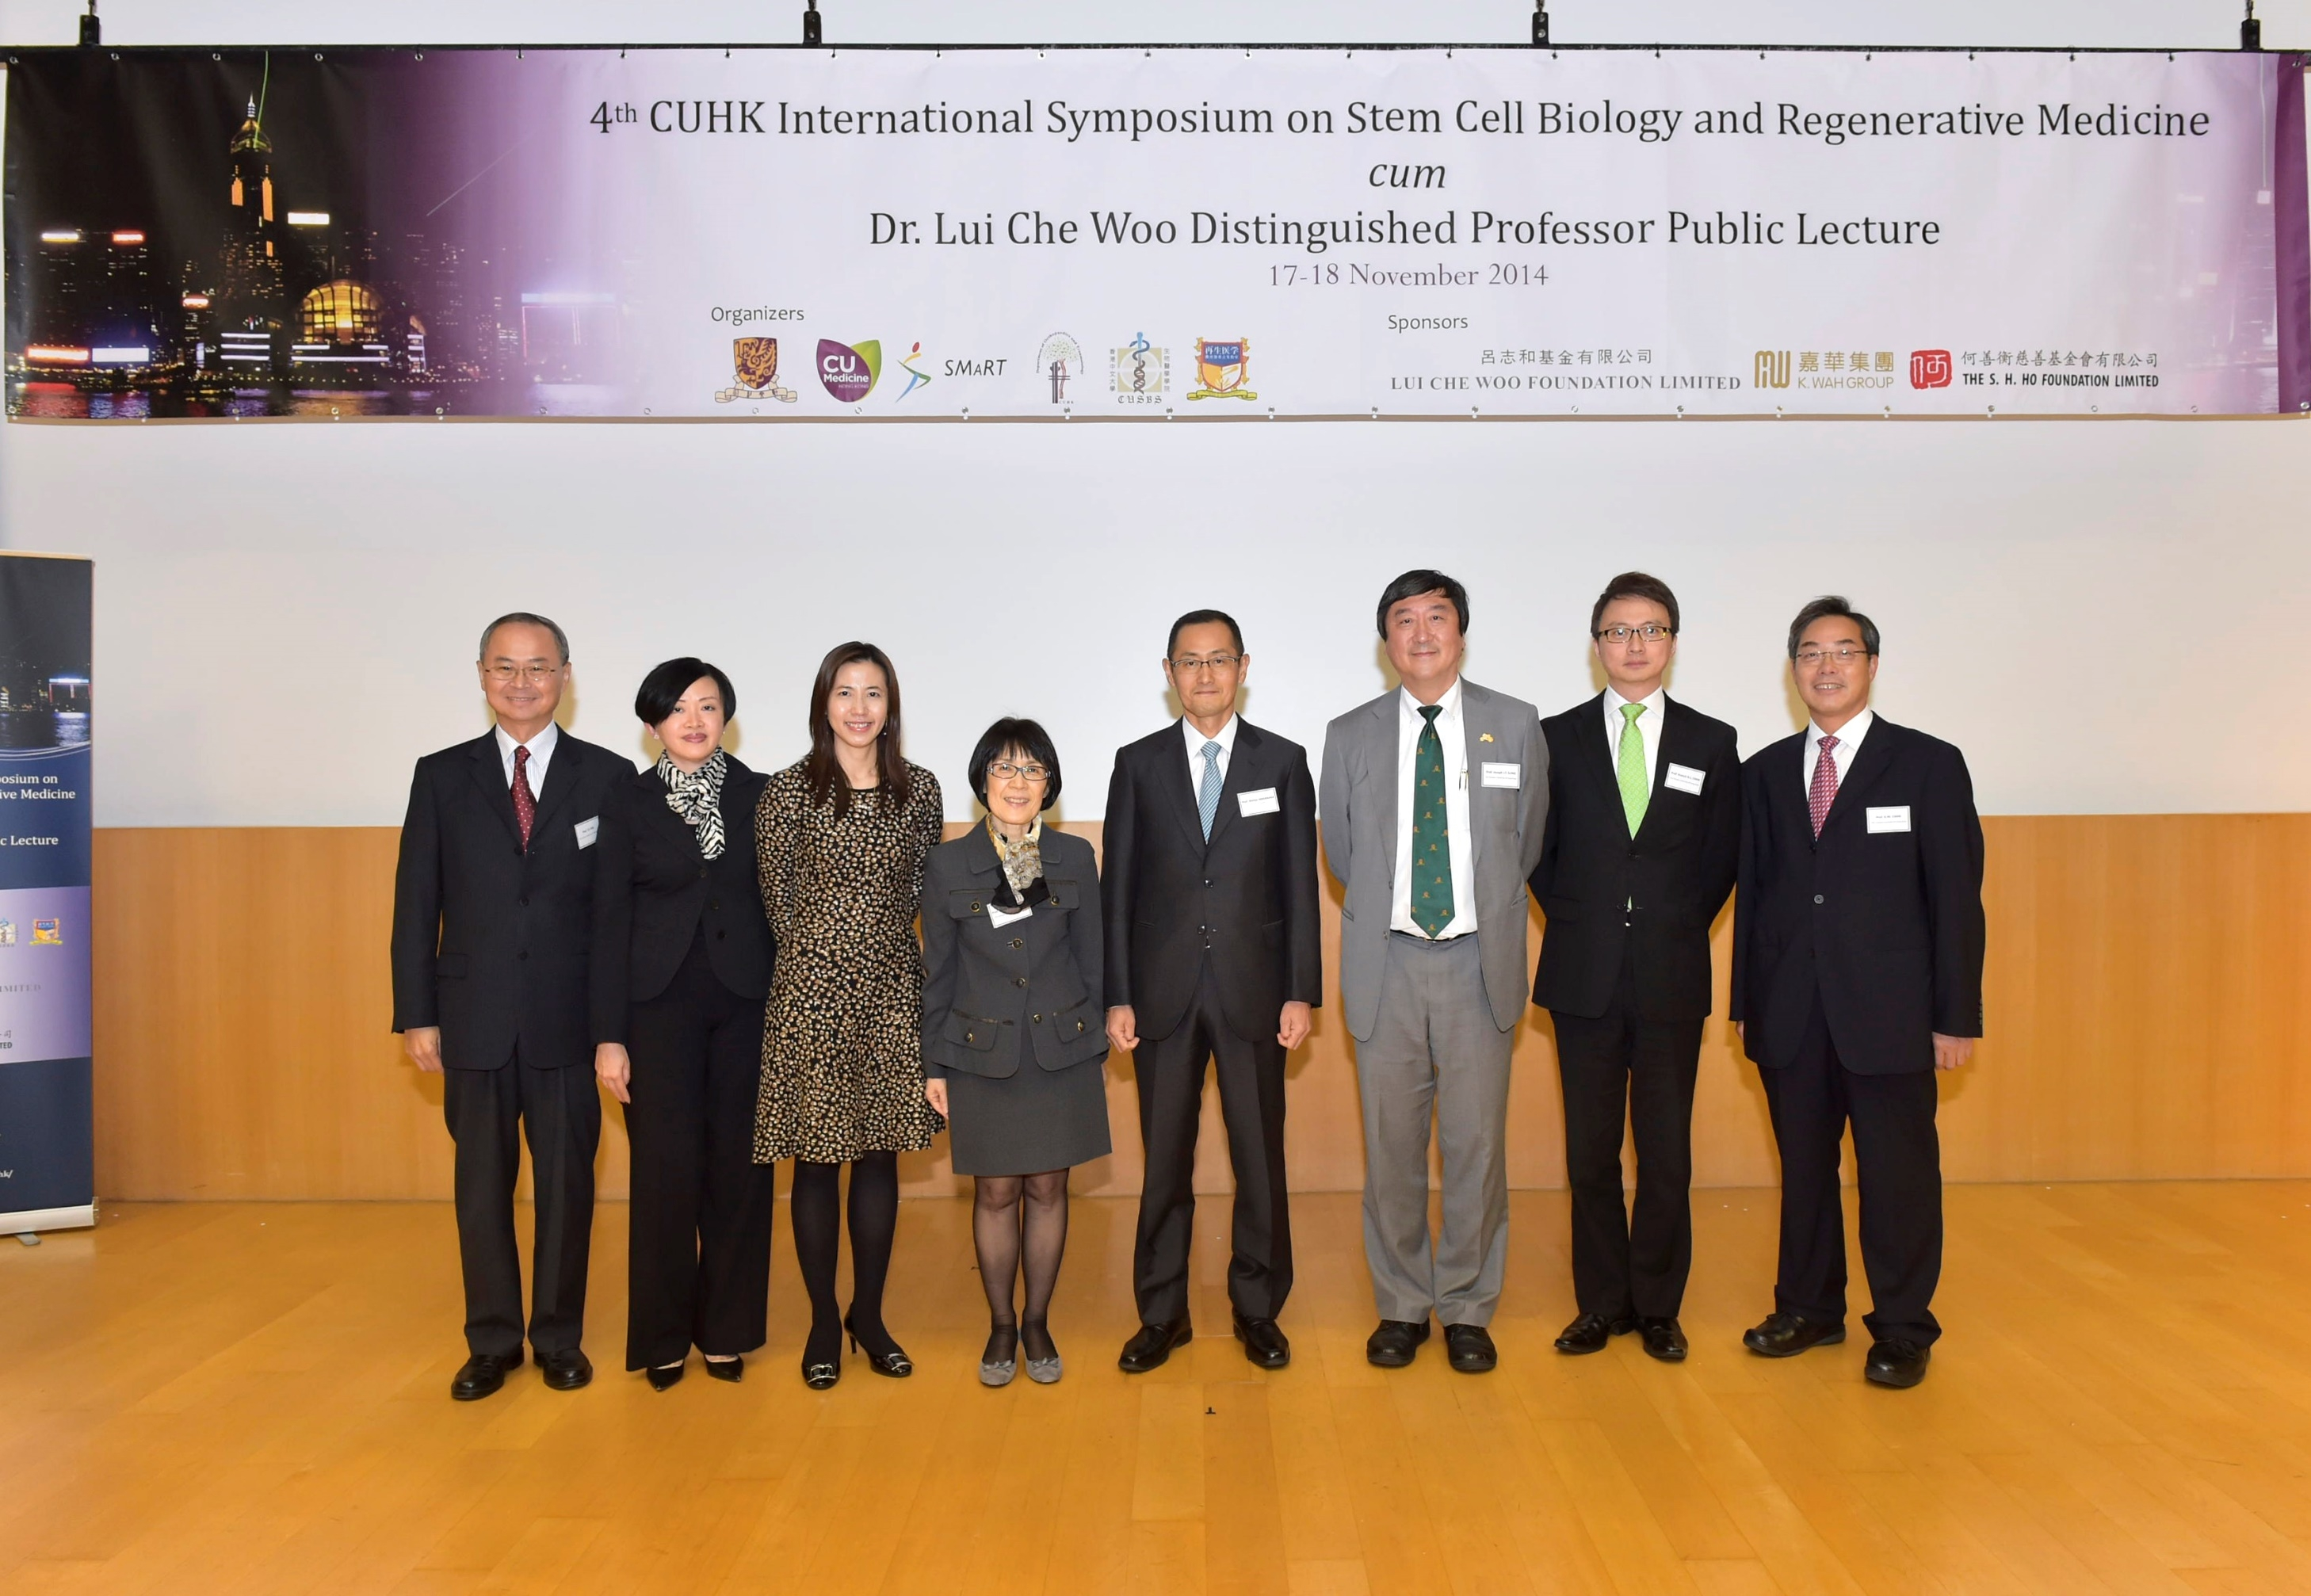 A group photo with Prof. Shinya Yamanaka.